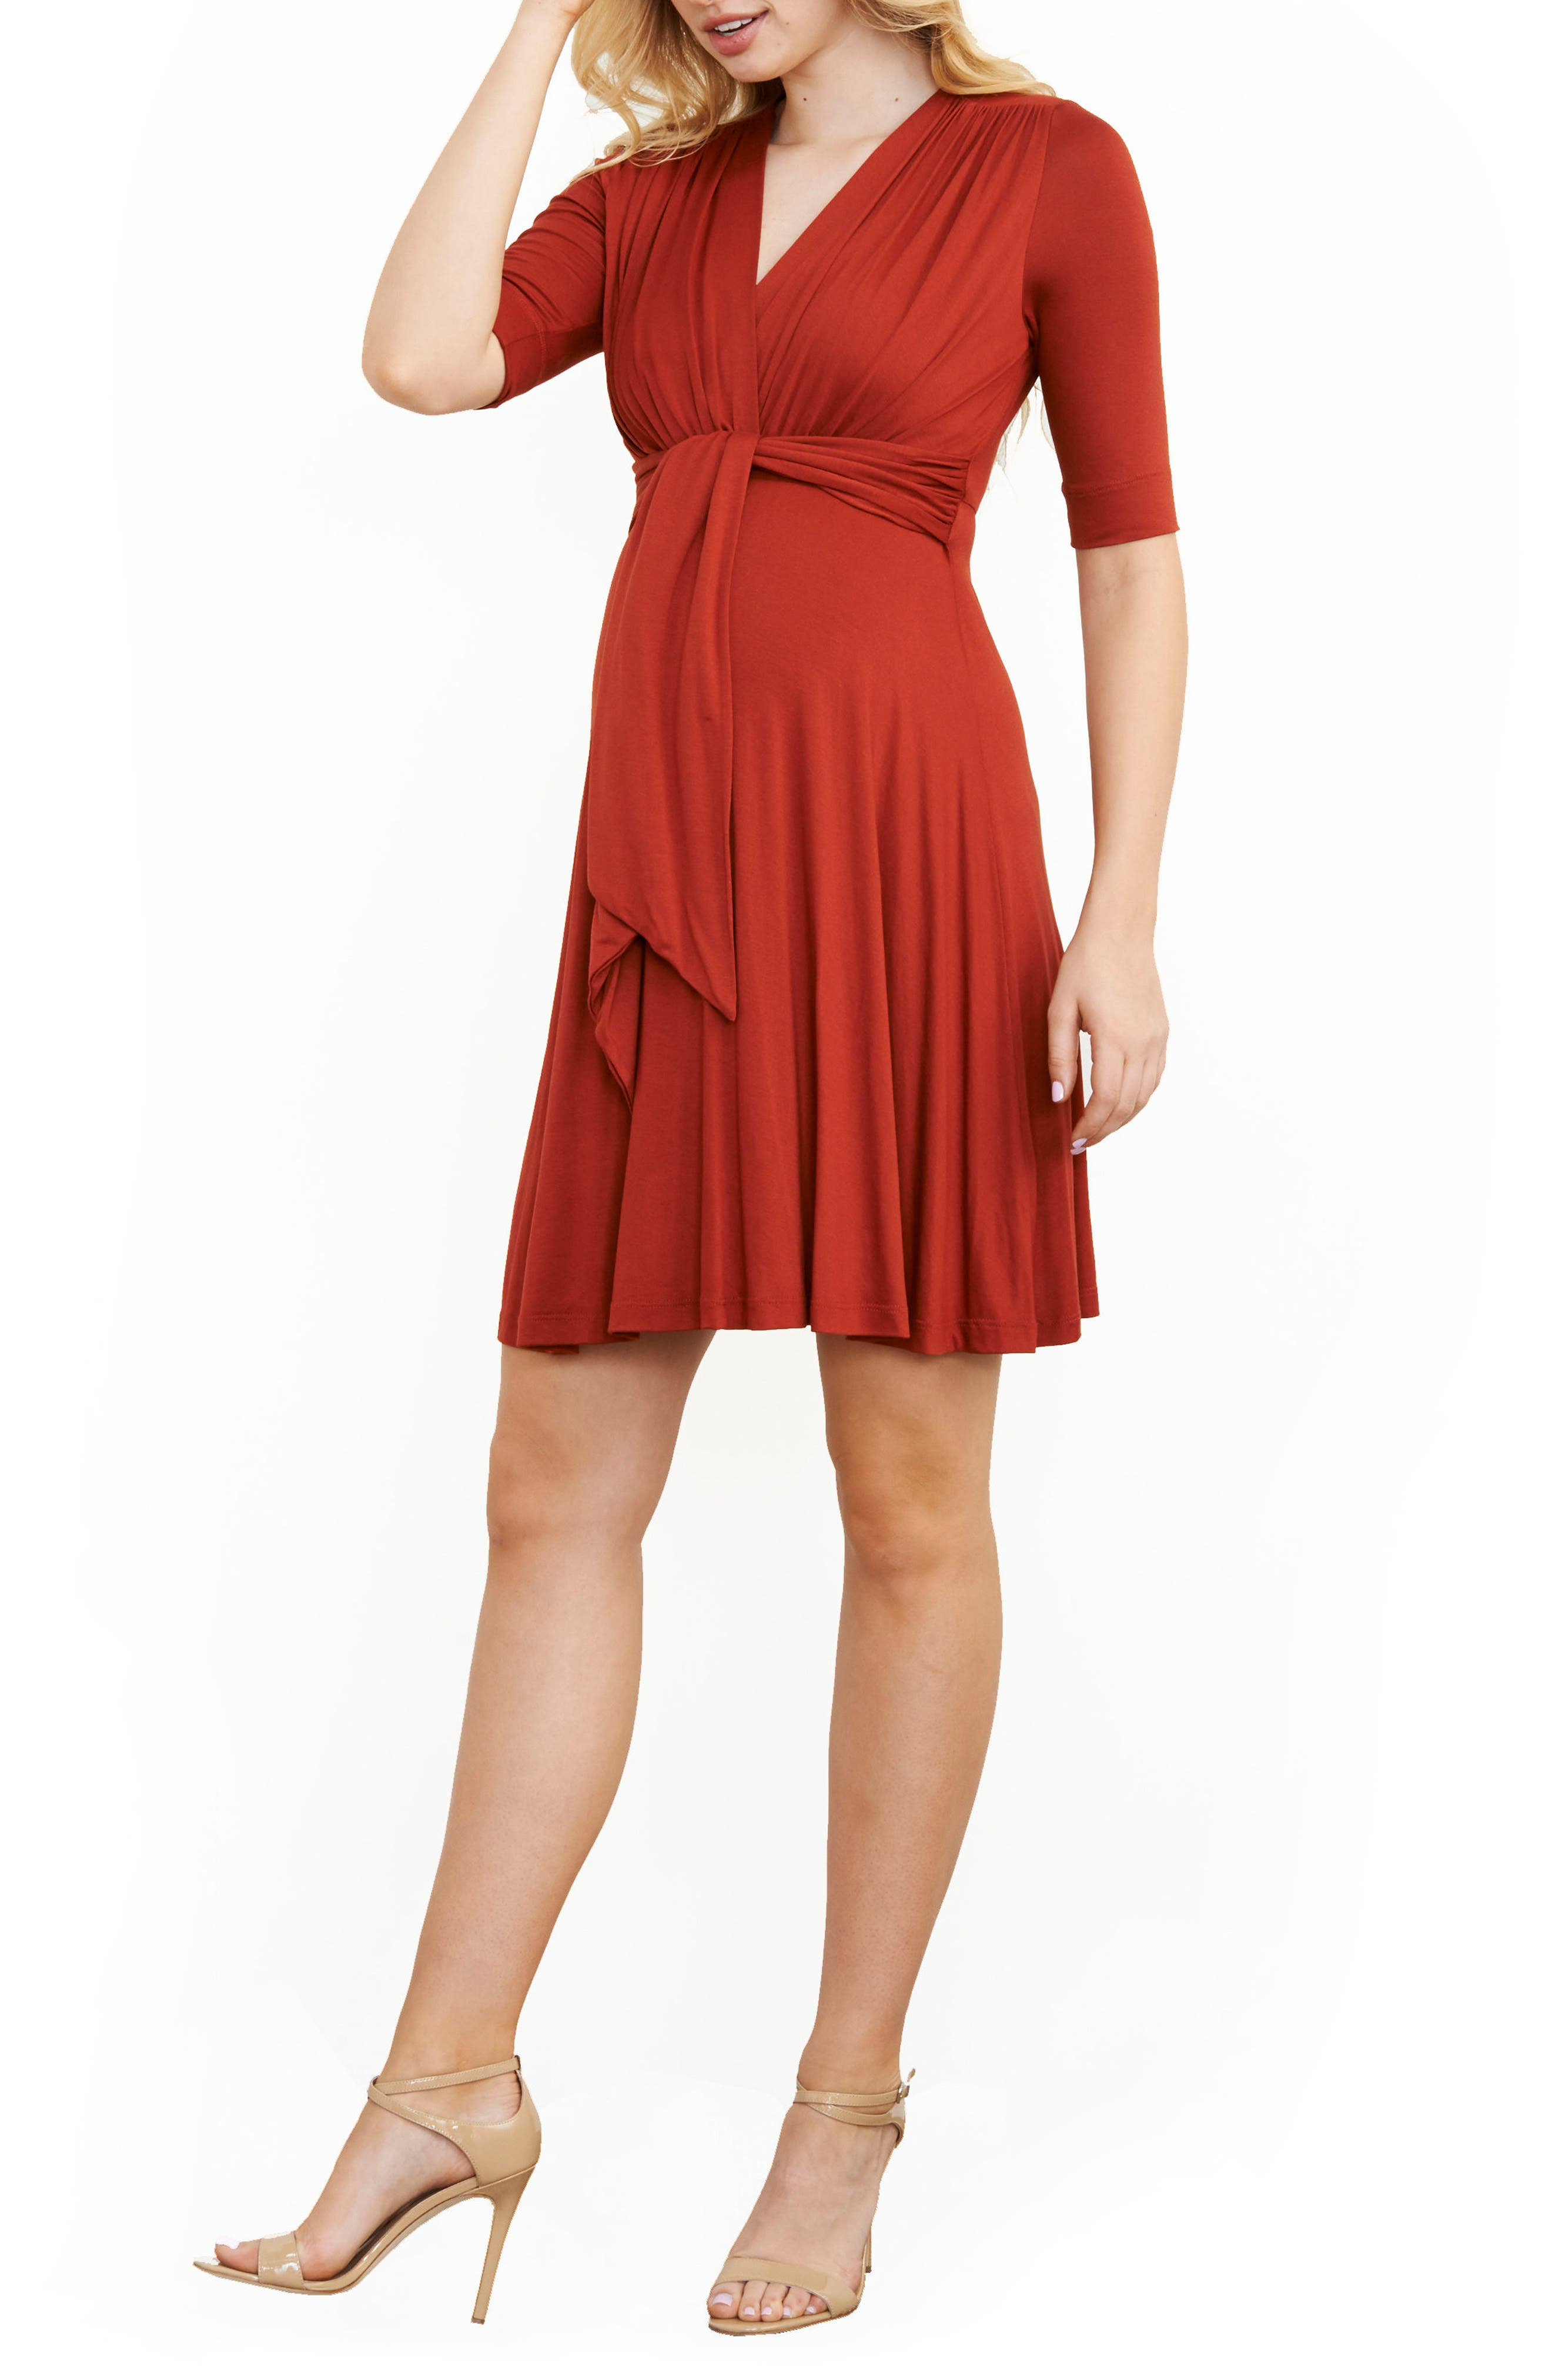 MATERNAL AMERICA, Maternity Tie Front Dress, Main thumbnail 1, color, RUST